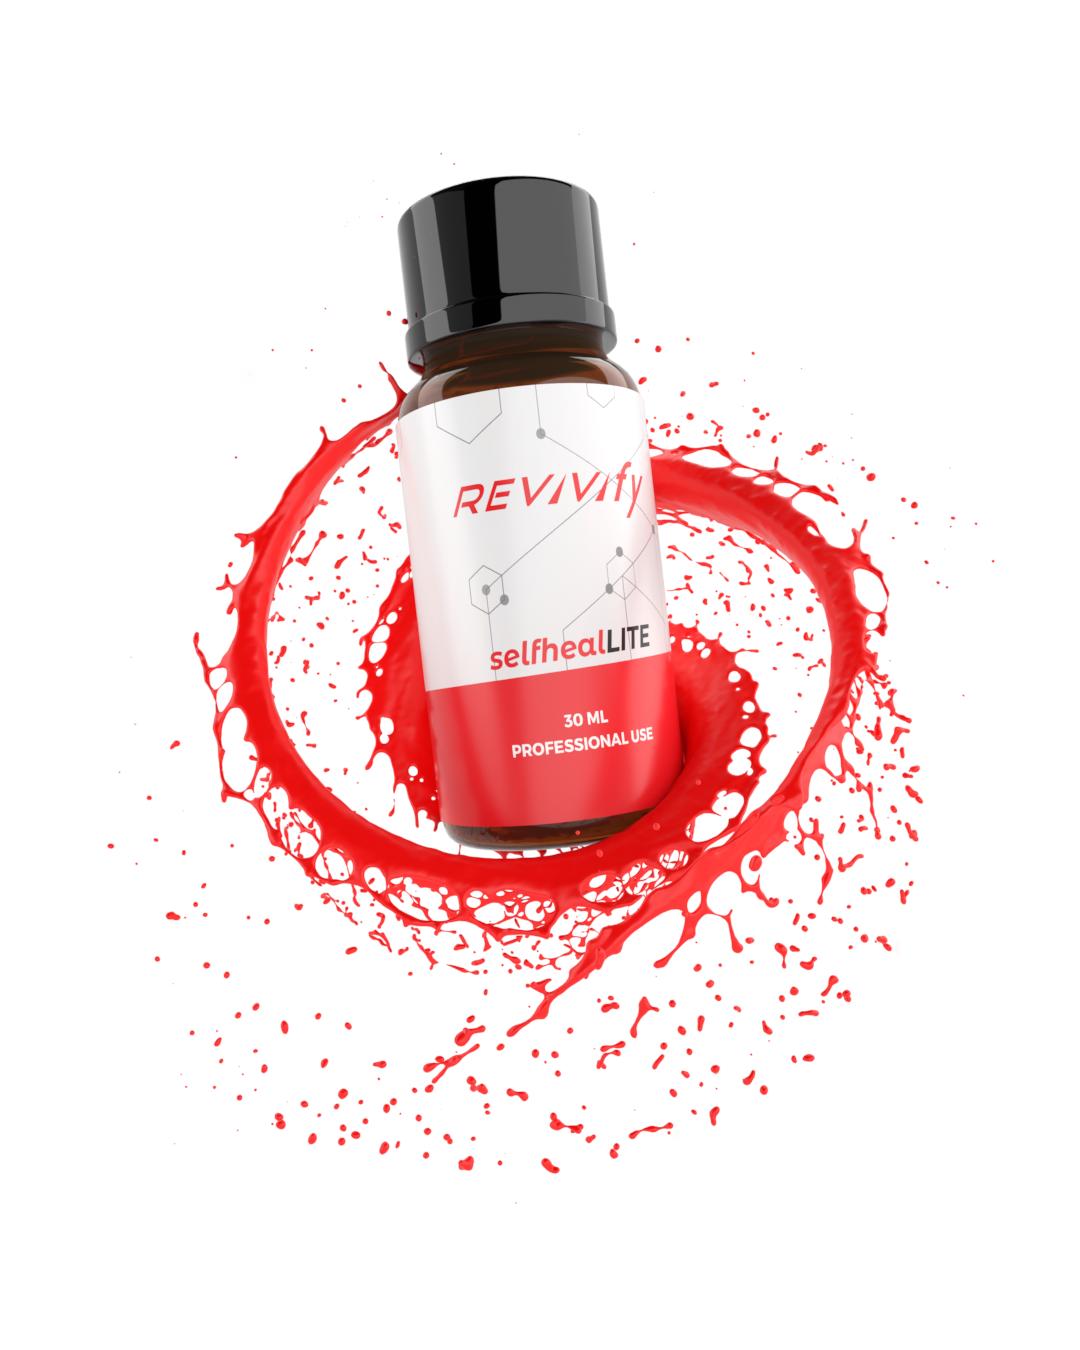 revivify self heal ceramic coating edmonton